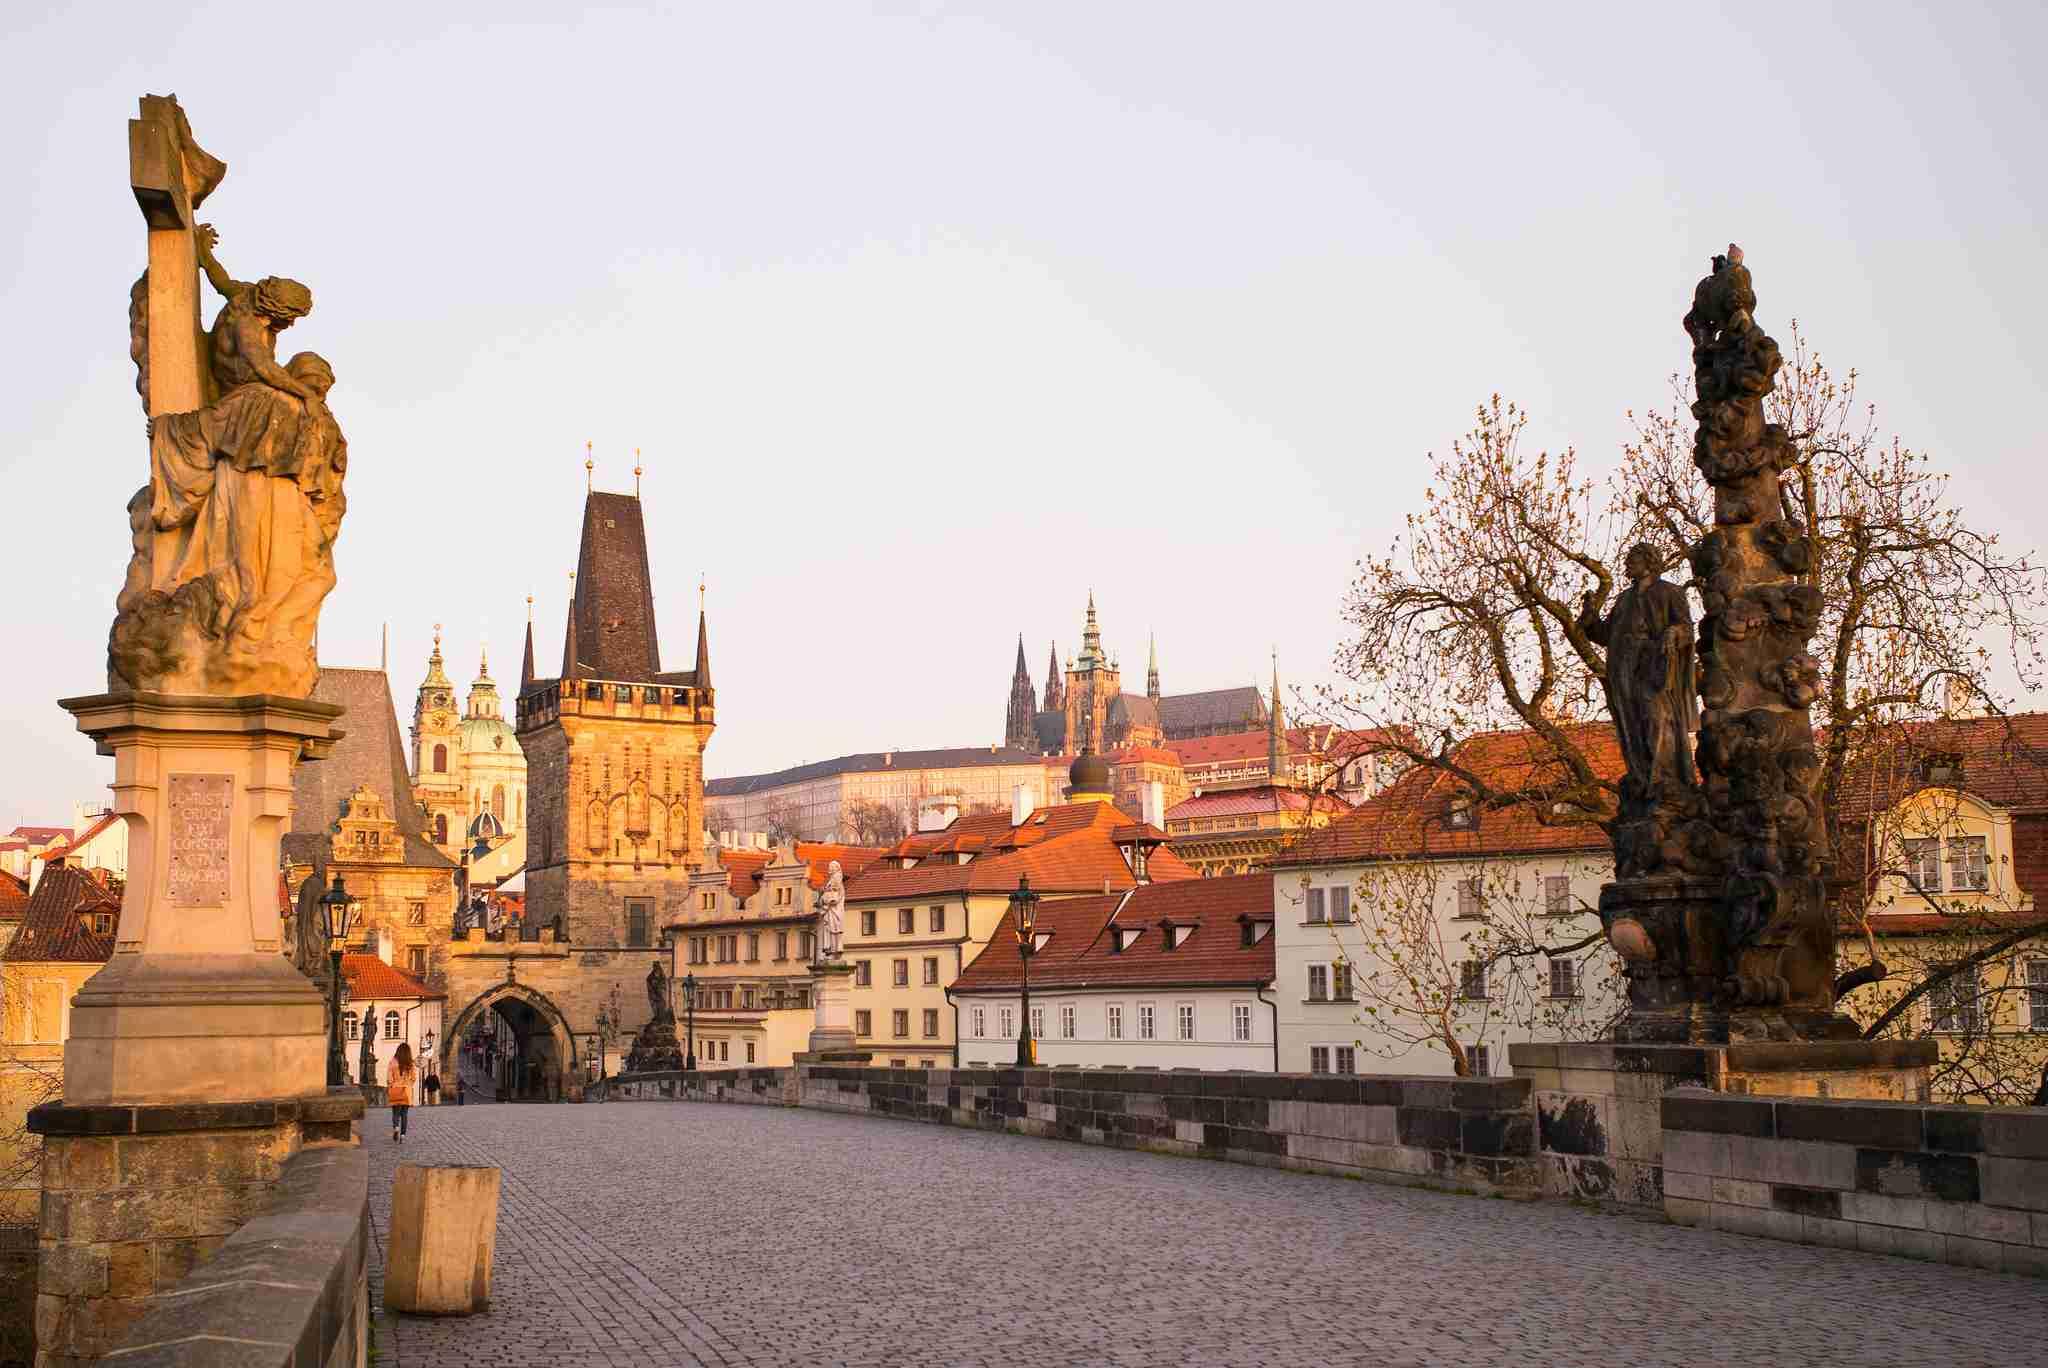 Praga en el sol de la mañana